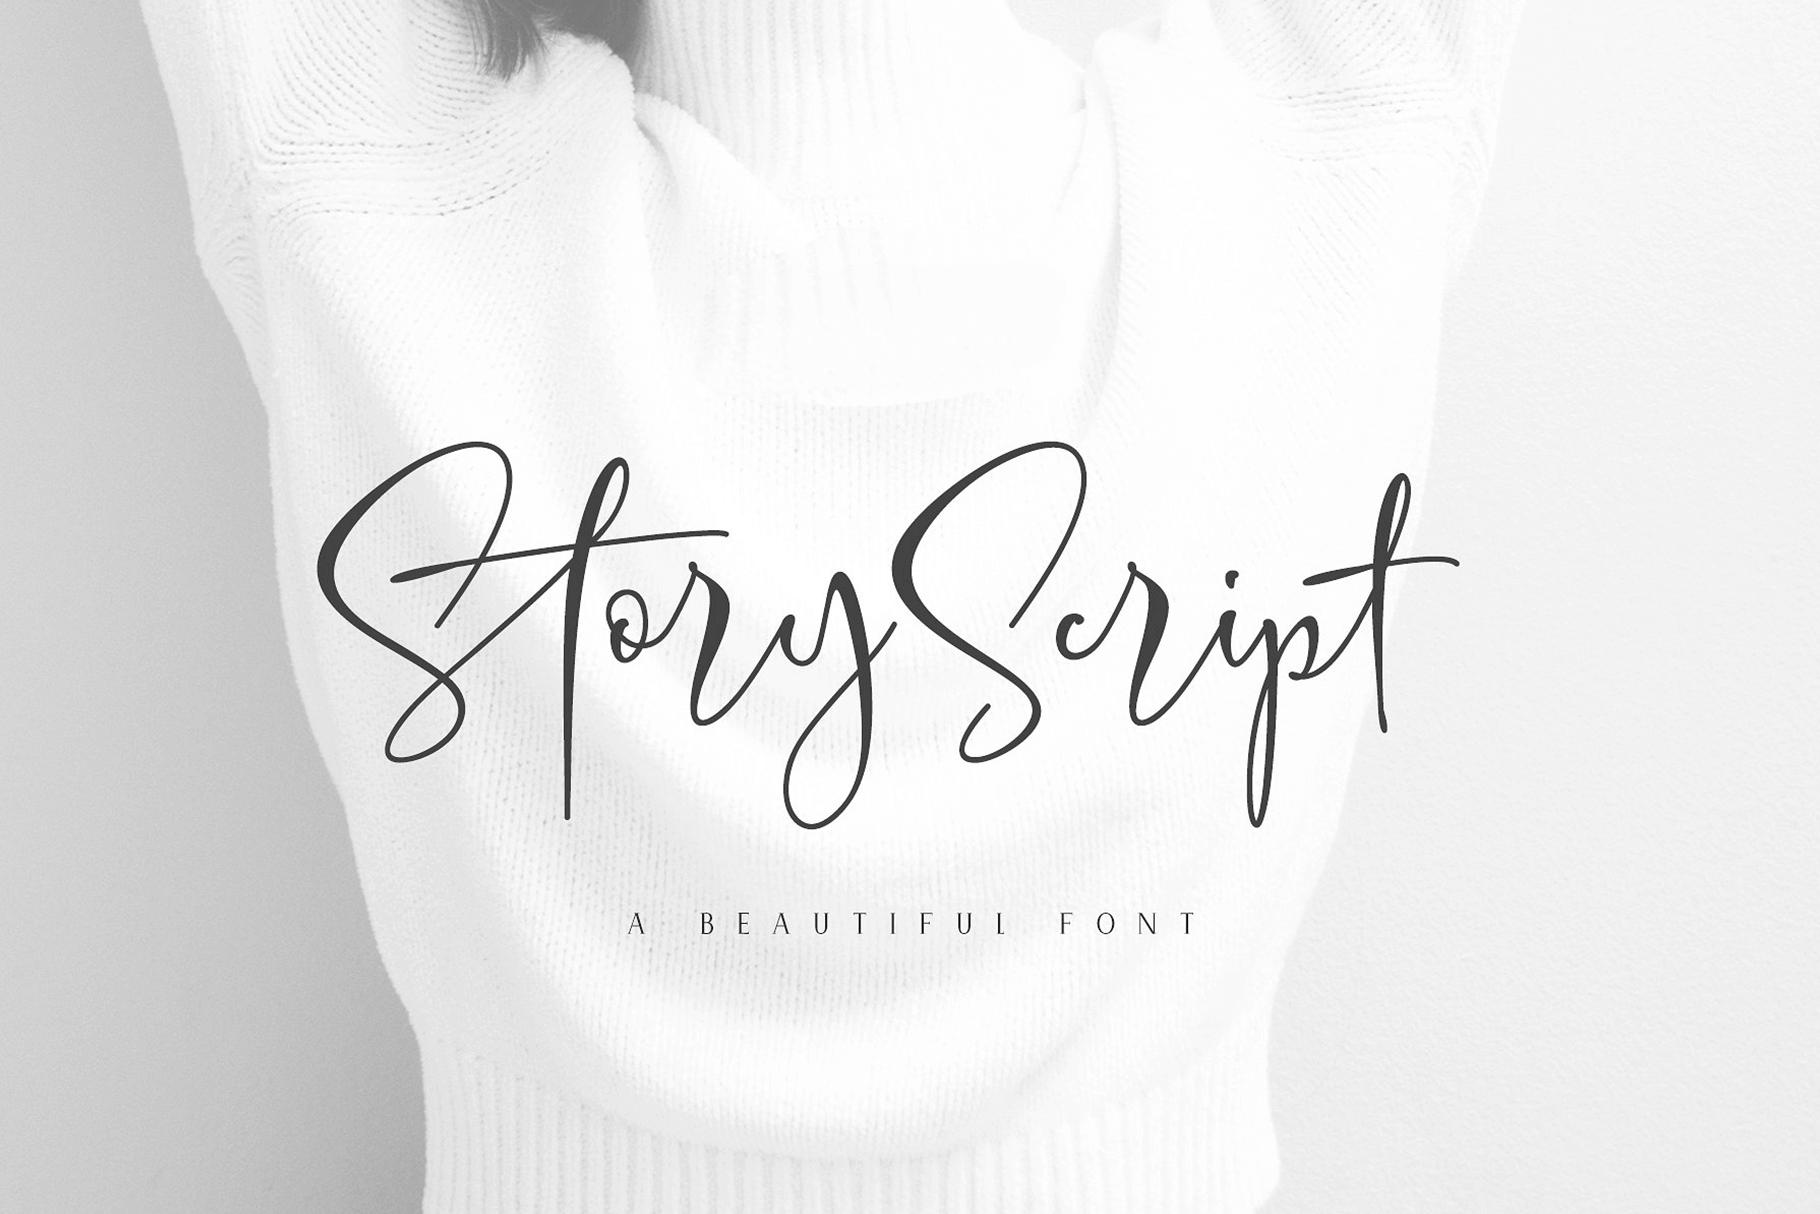 Elegant, Handwritten Script Font: Story Script - only $7! - MightyDeals